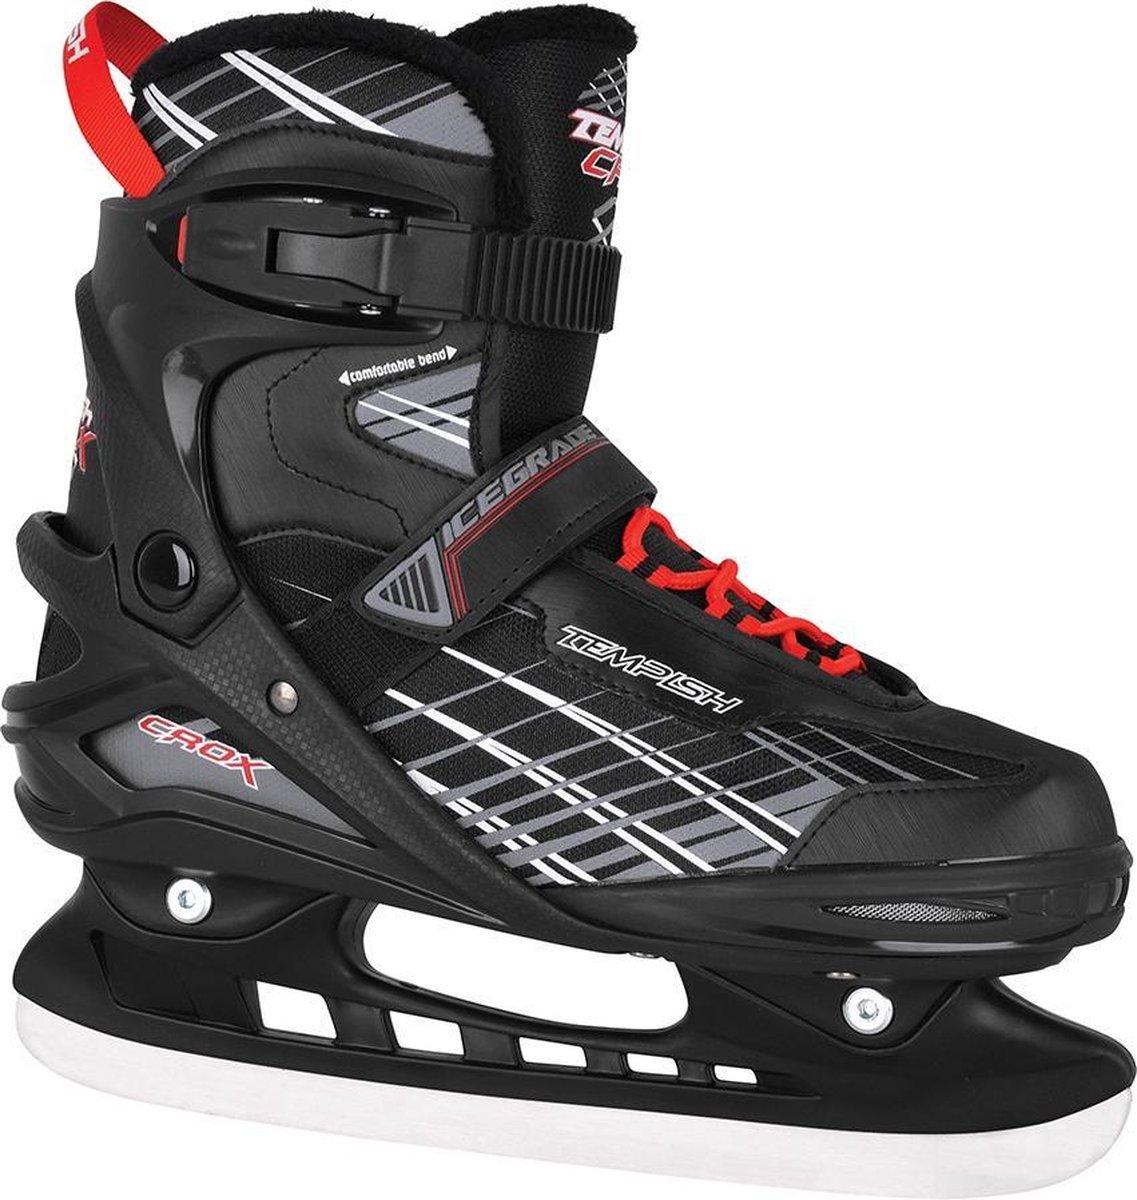 Tempish IJshockeyschaatsen CROX Zwart/Rood 42